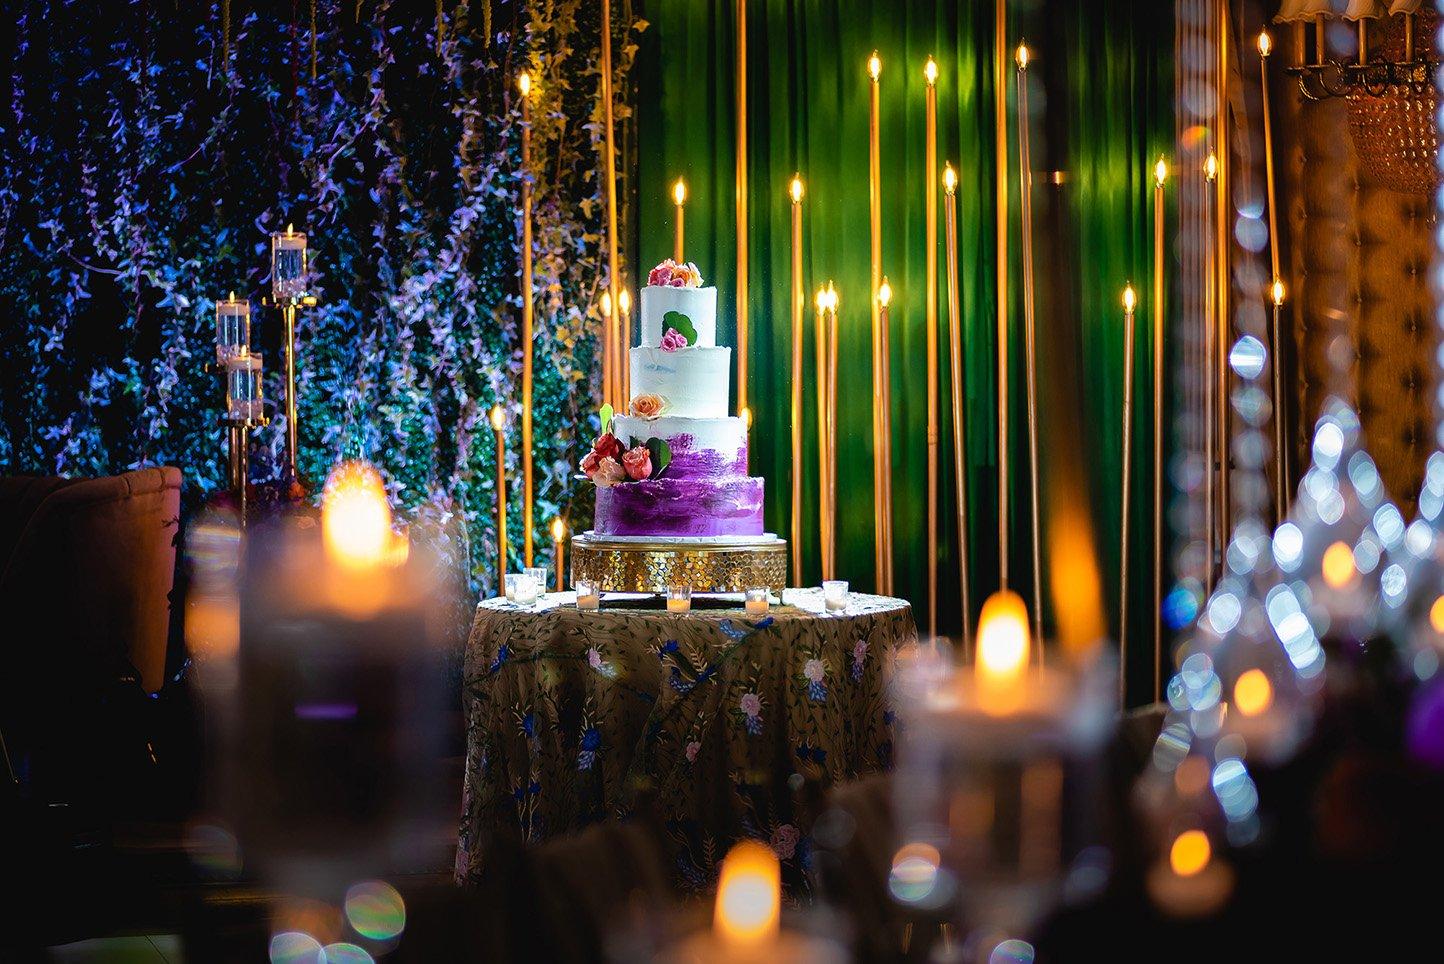 Leonards-Palazzo-Wedding-Decor Details